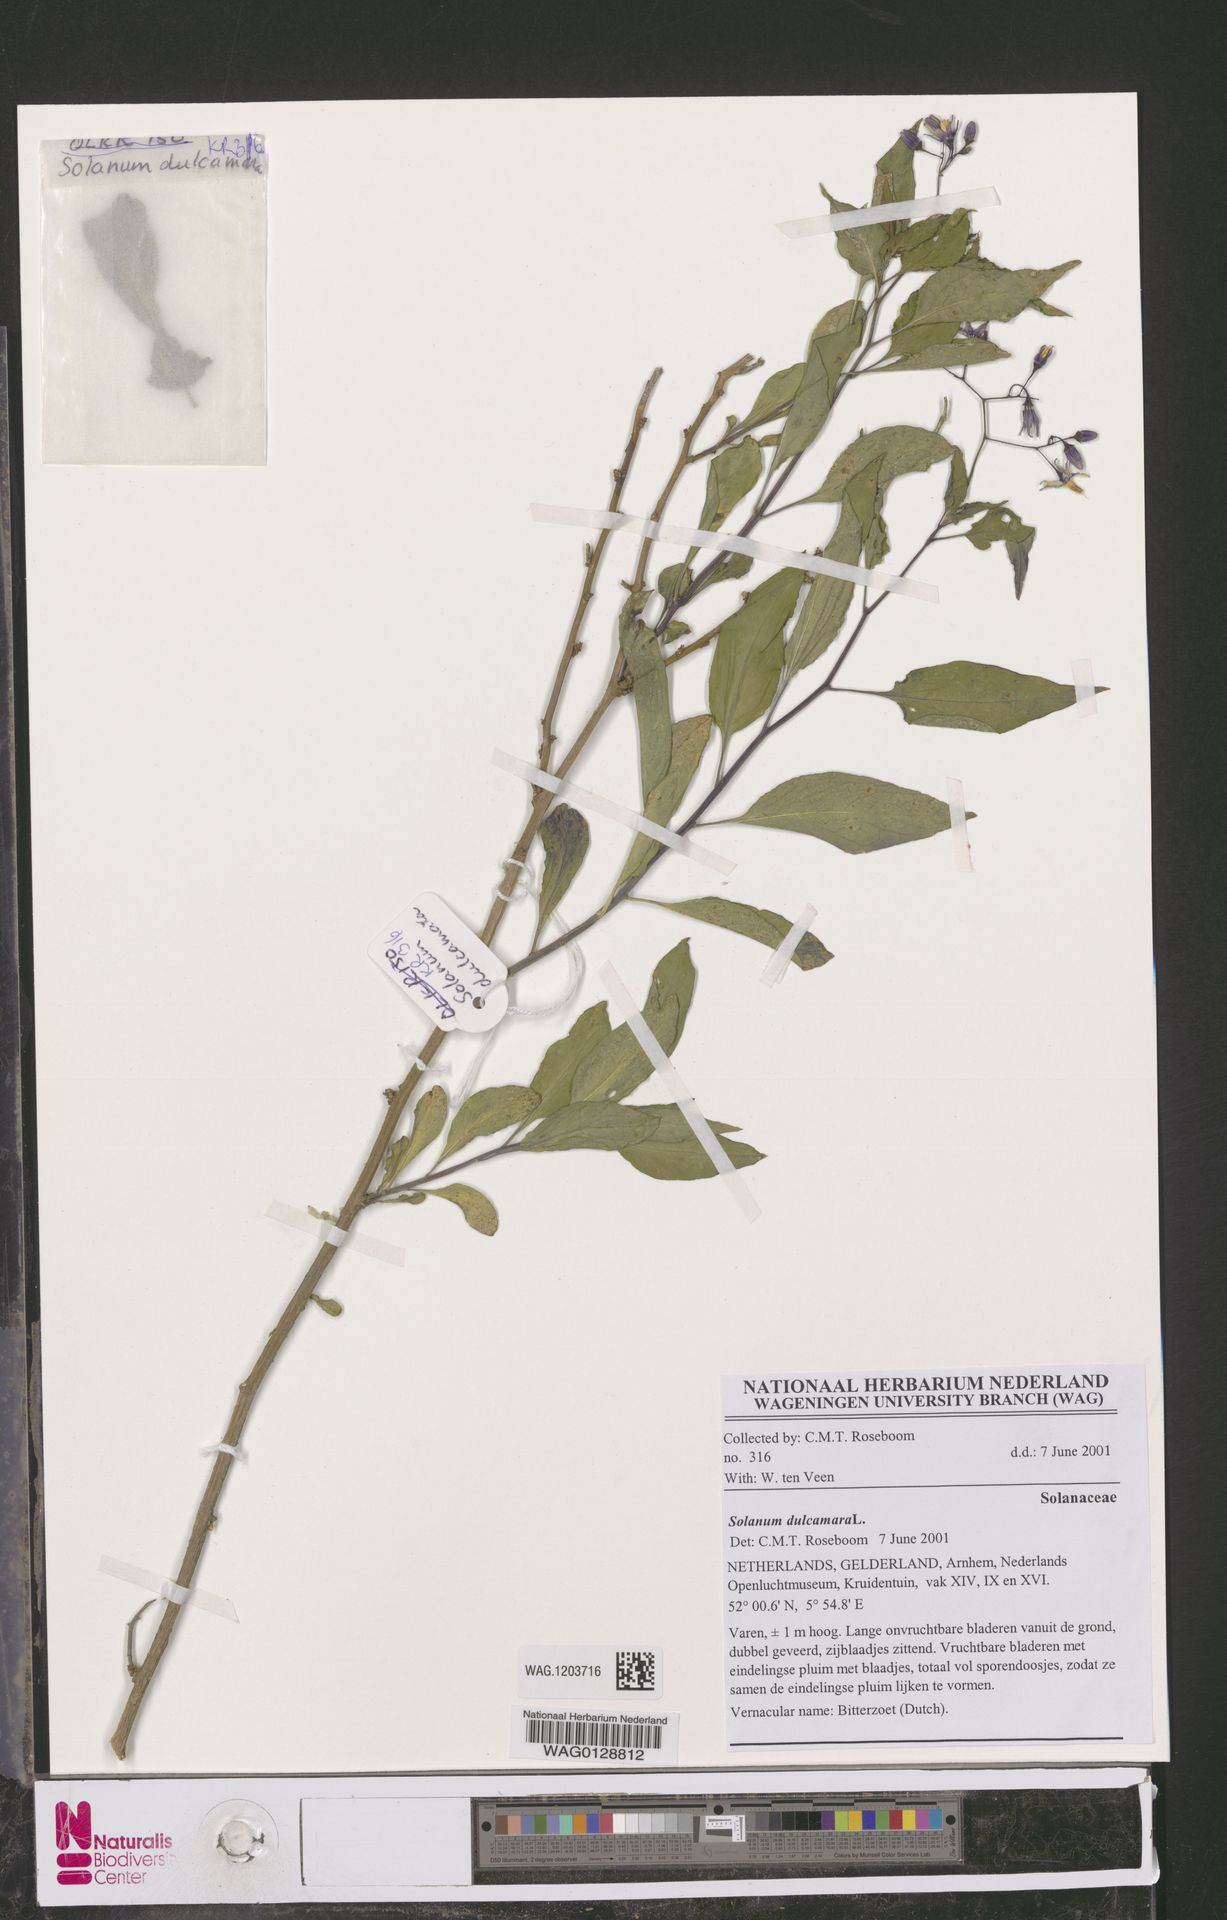 WAG.1203716 | Solanum dulcamara L.